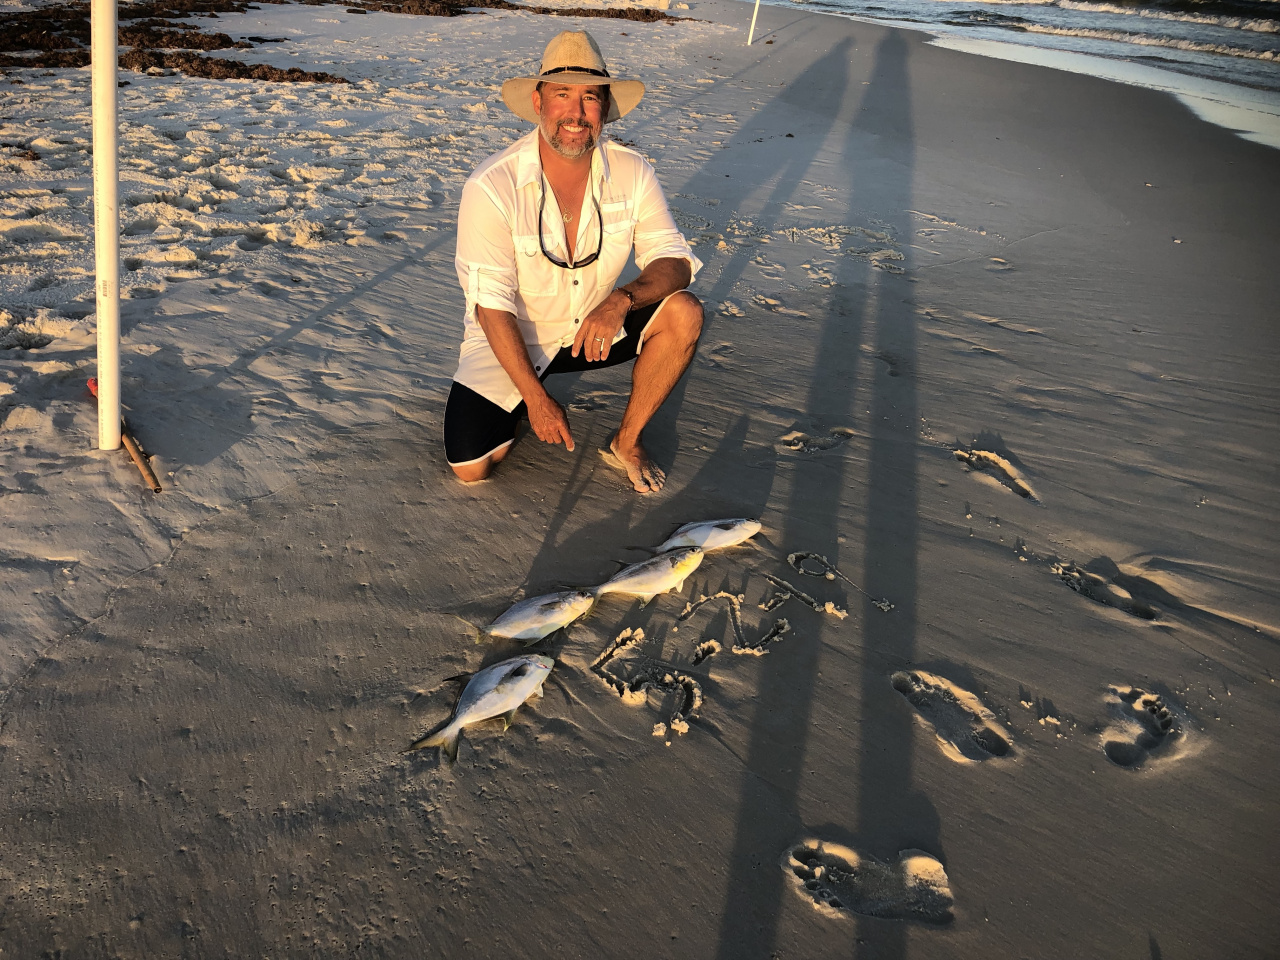 Pensacola Beach, May 2-jiedolaus4kbnl88ibzzkq-jpg